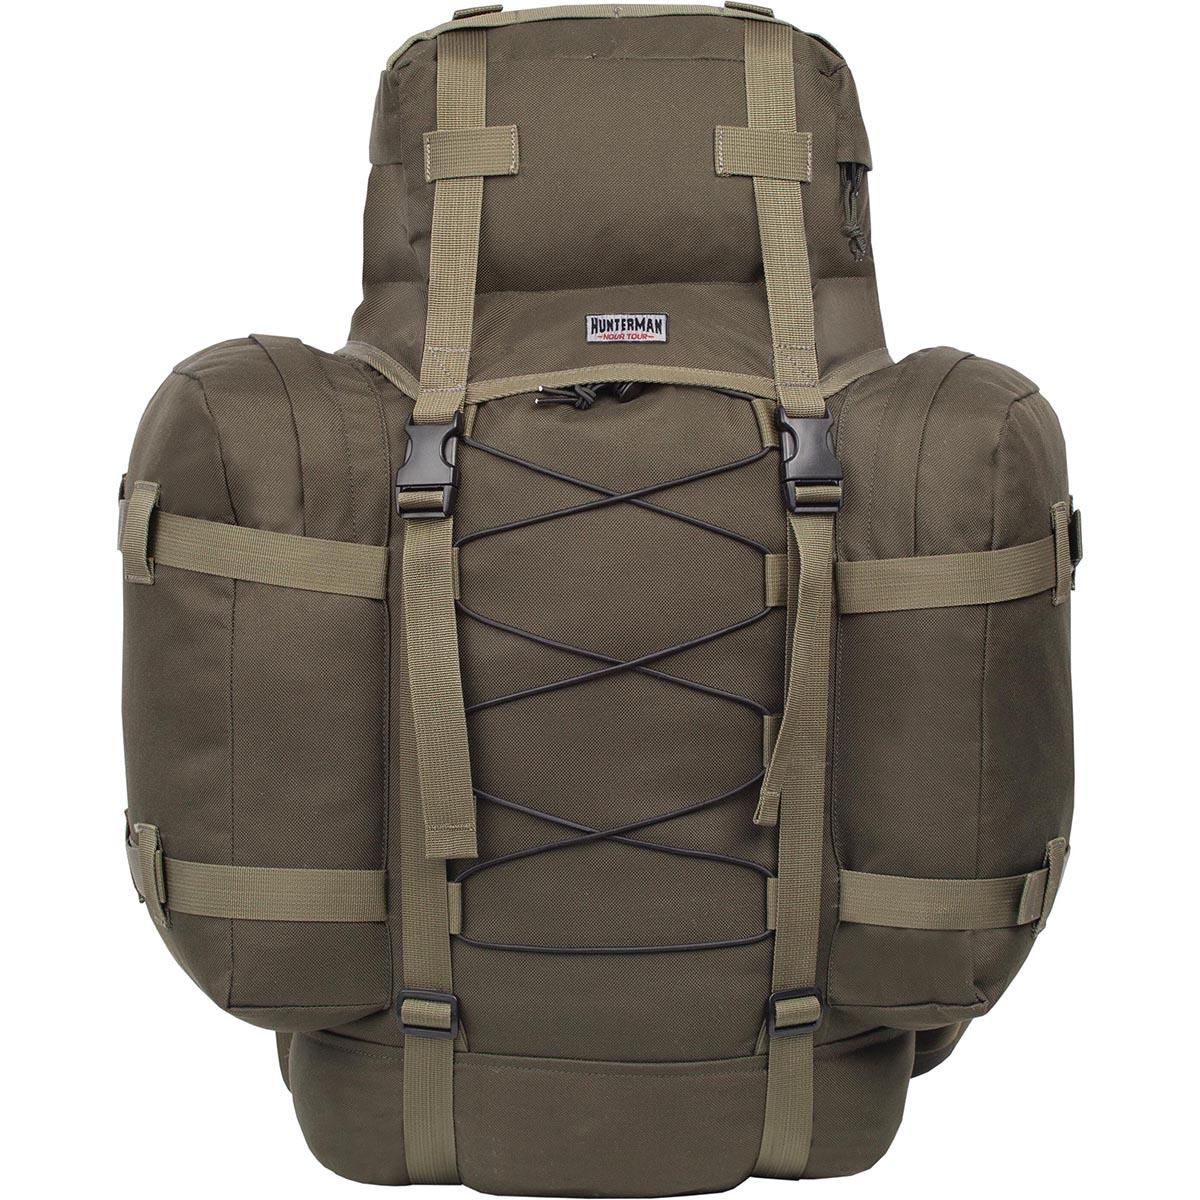 Рюкзак для охоты HunterMan Nova Tour Контур 75 V3, цвет: зеленый, 75 л рюкзак для охоты nova tour медведь 100 v3 км